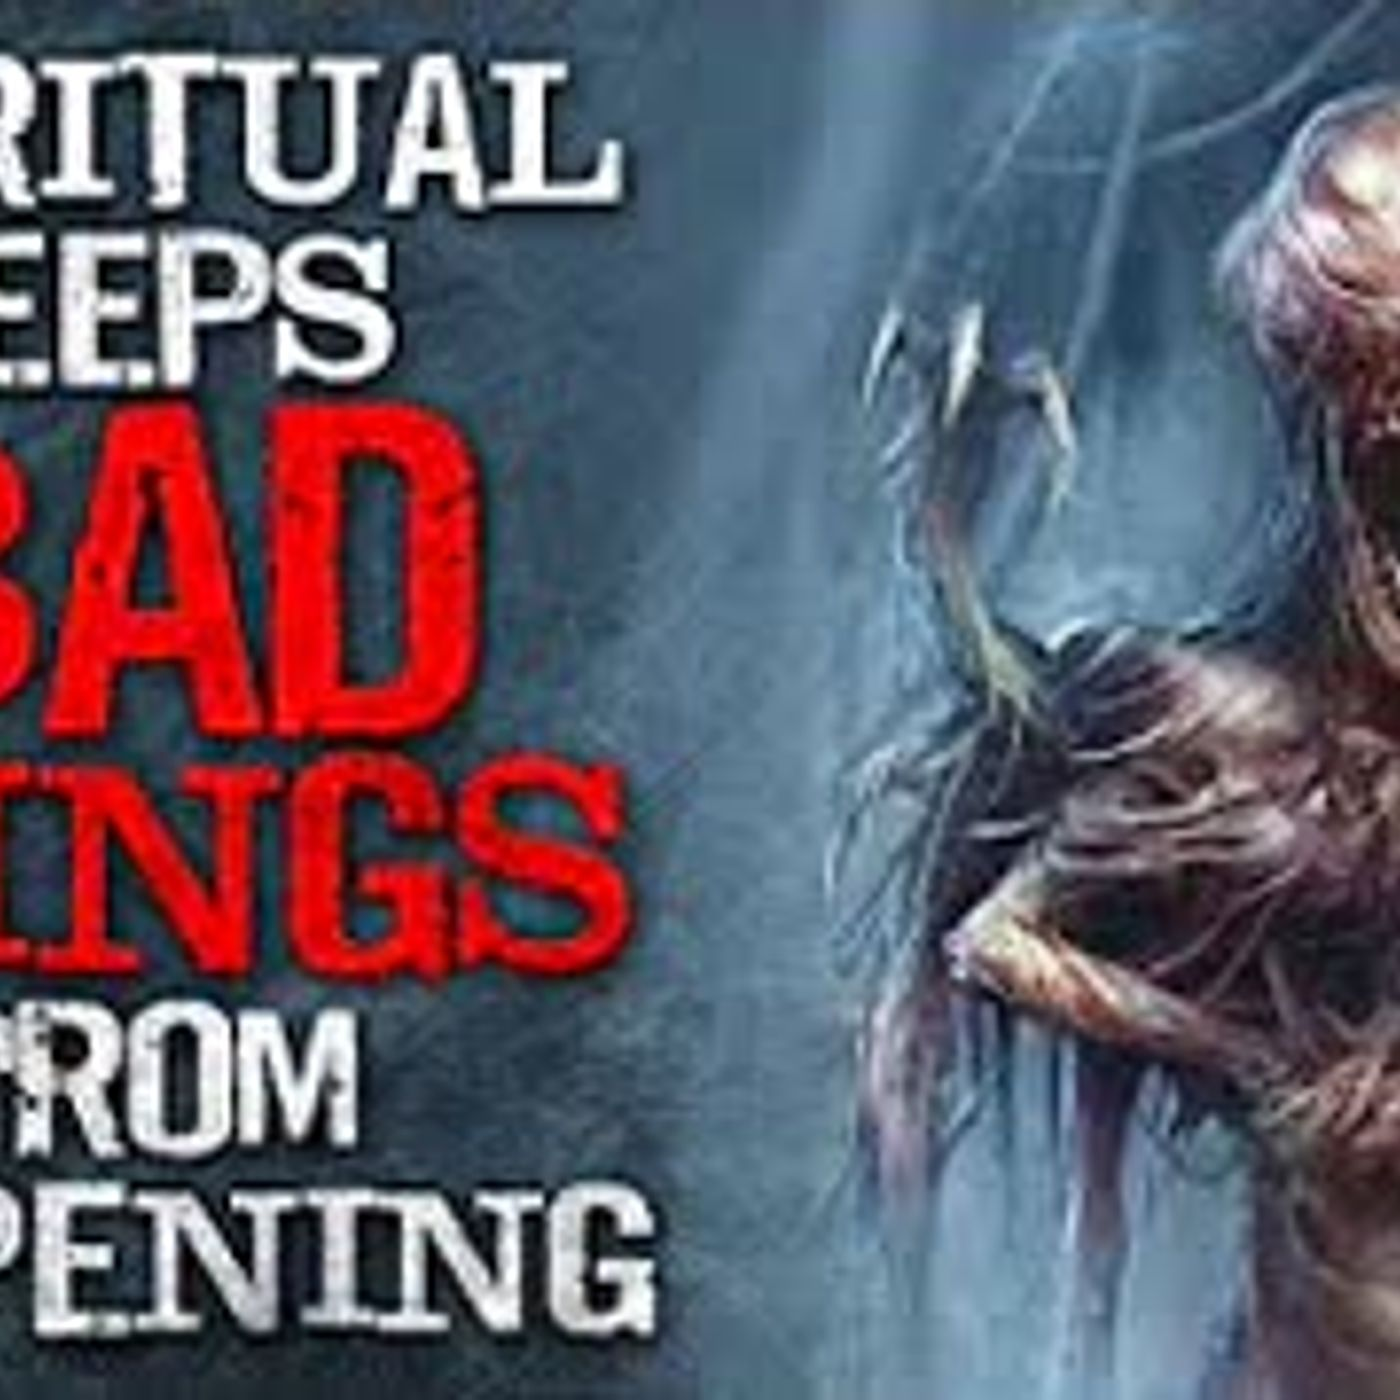 """My Ritual Keeps Bad Things From Happening"" Creepypasta"